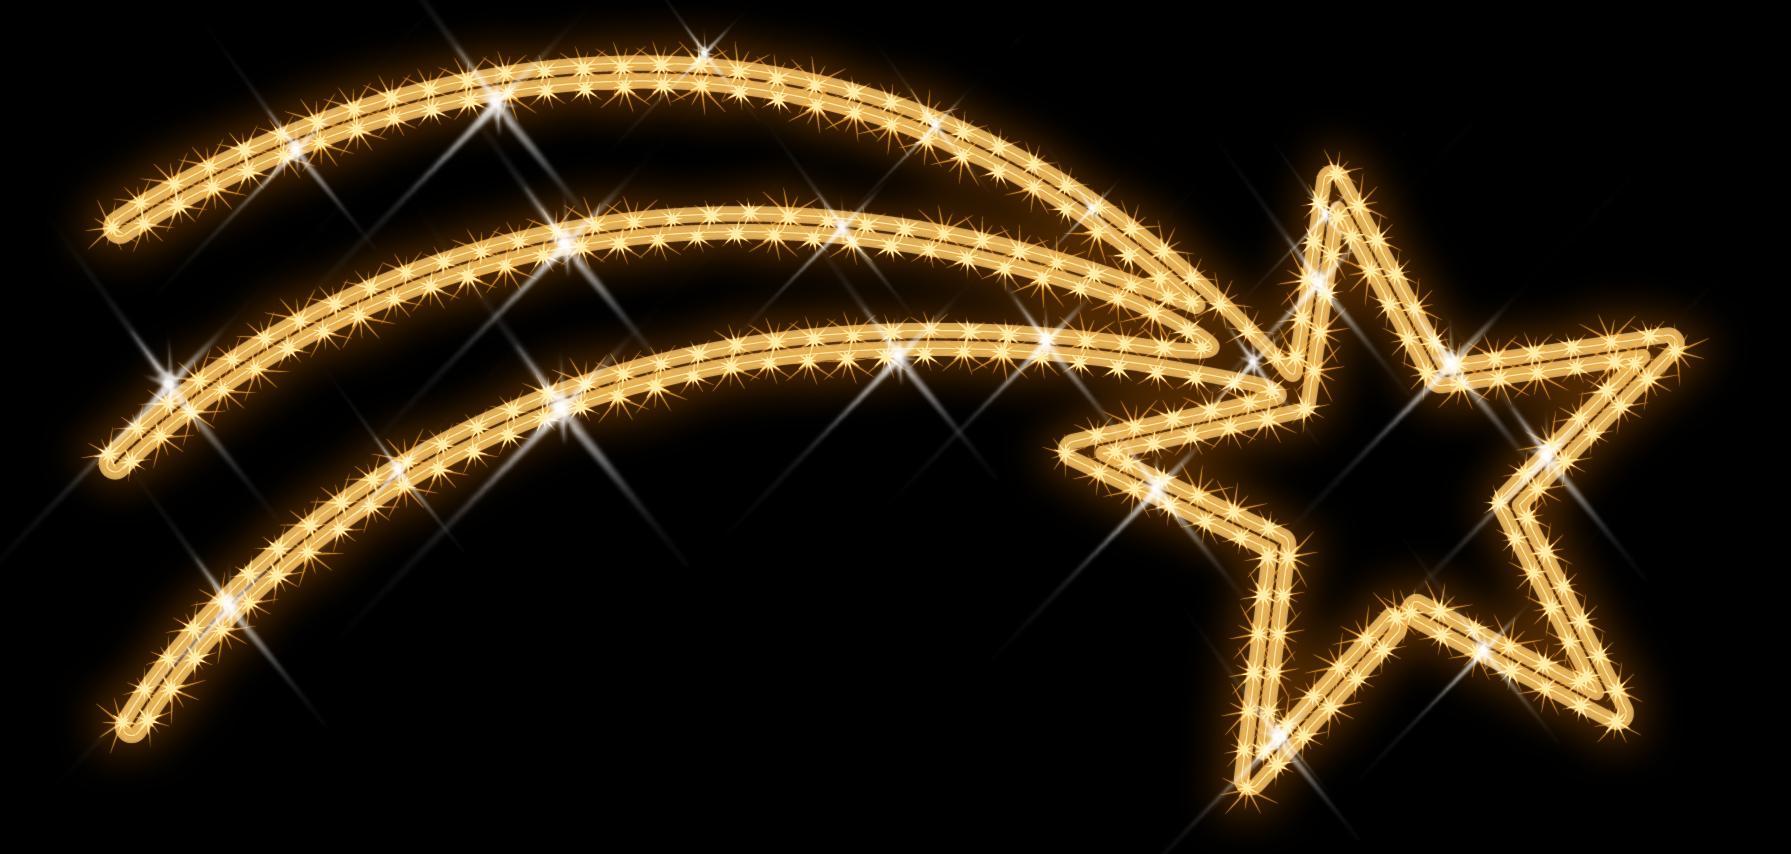 Led Weihnachtsbeleuchtung Komet.Comet